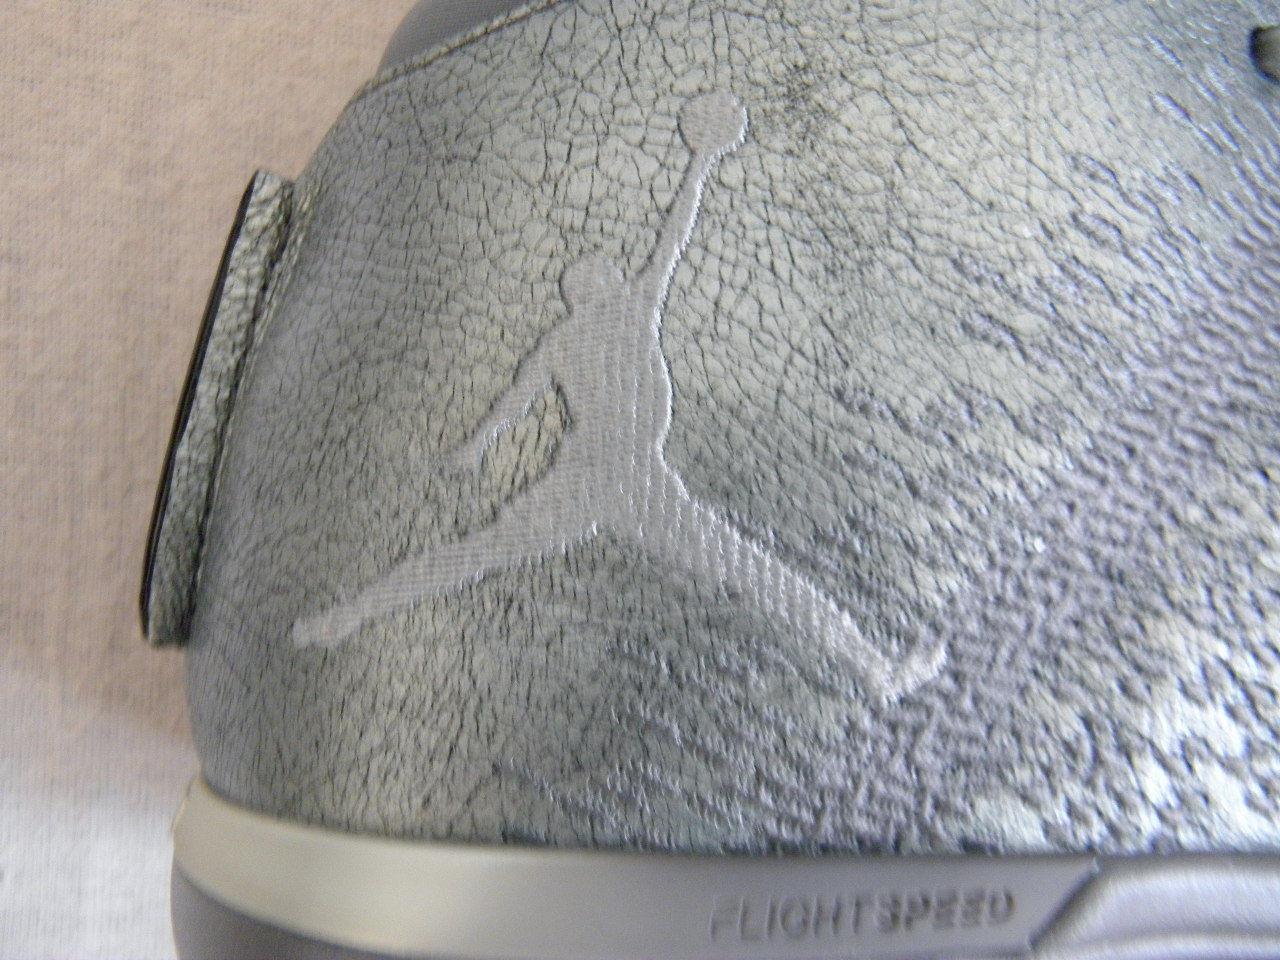 Nike Air Jordan XXX1 XXXI 31 Premium PRM Battle Grey size 11 DS NEW NIB NWB